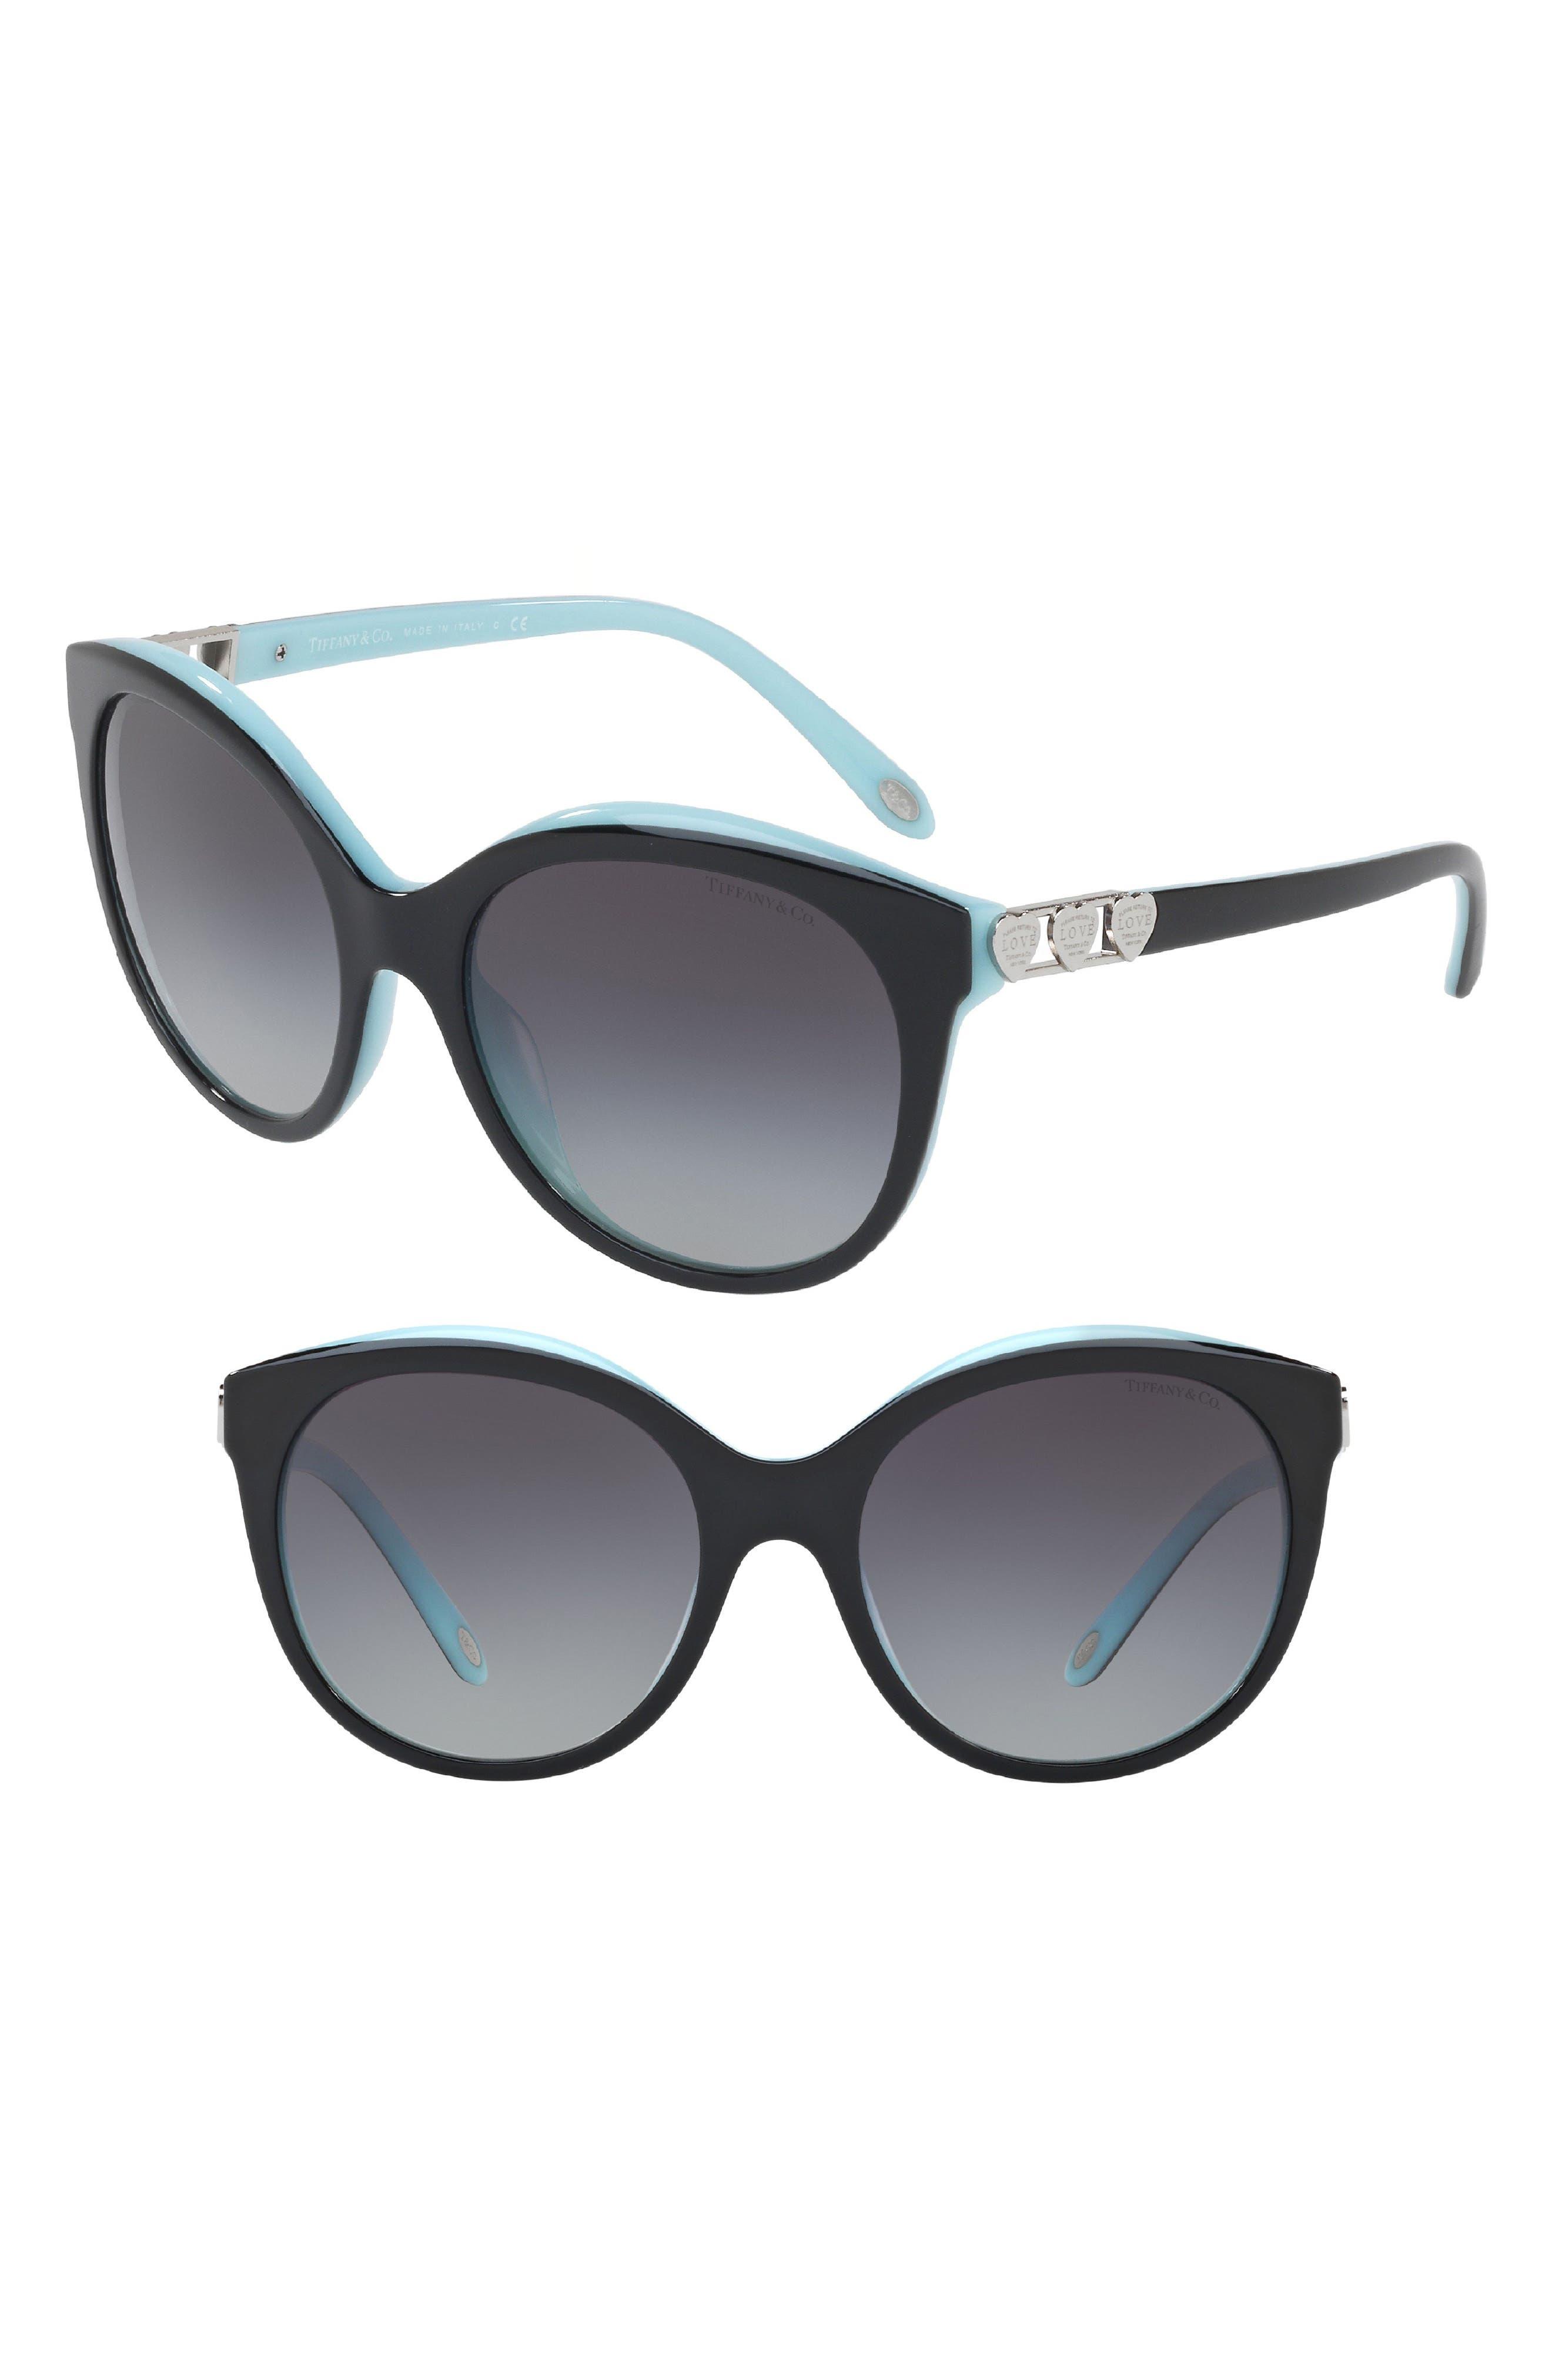 741587a35ffa Tiffany   Co. Sunglasses for Women